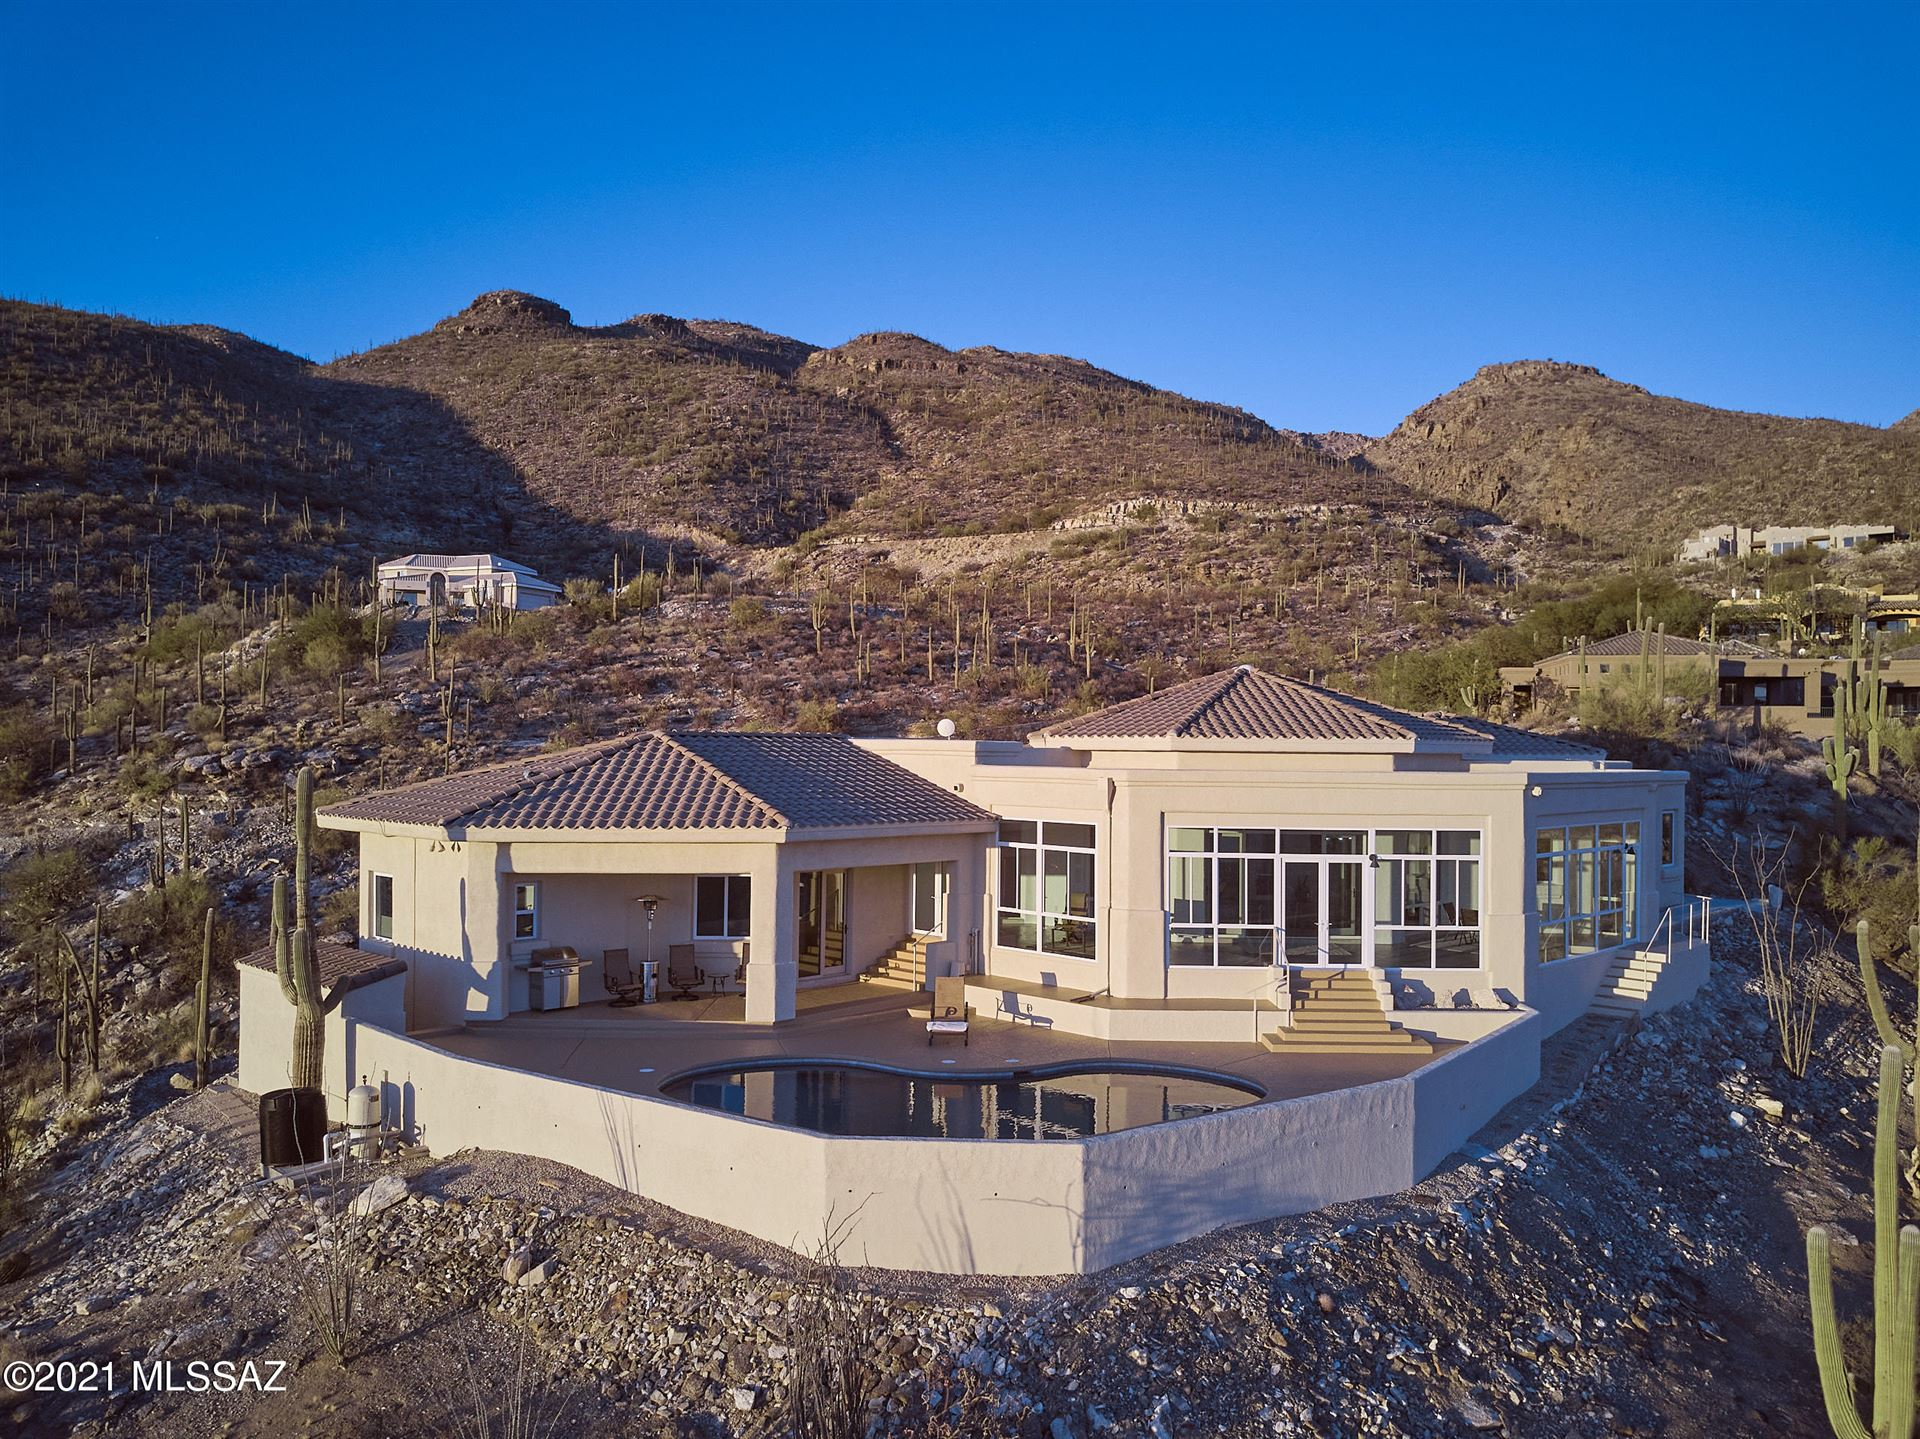 12130 E Quesada Place, Tucson, AZ 85749 - MLS#: 22100512